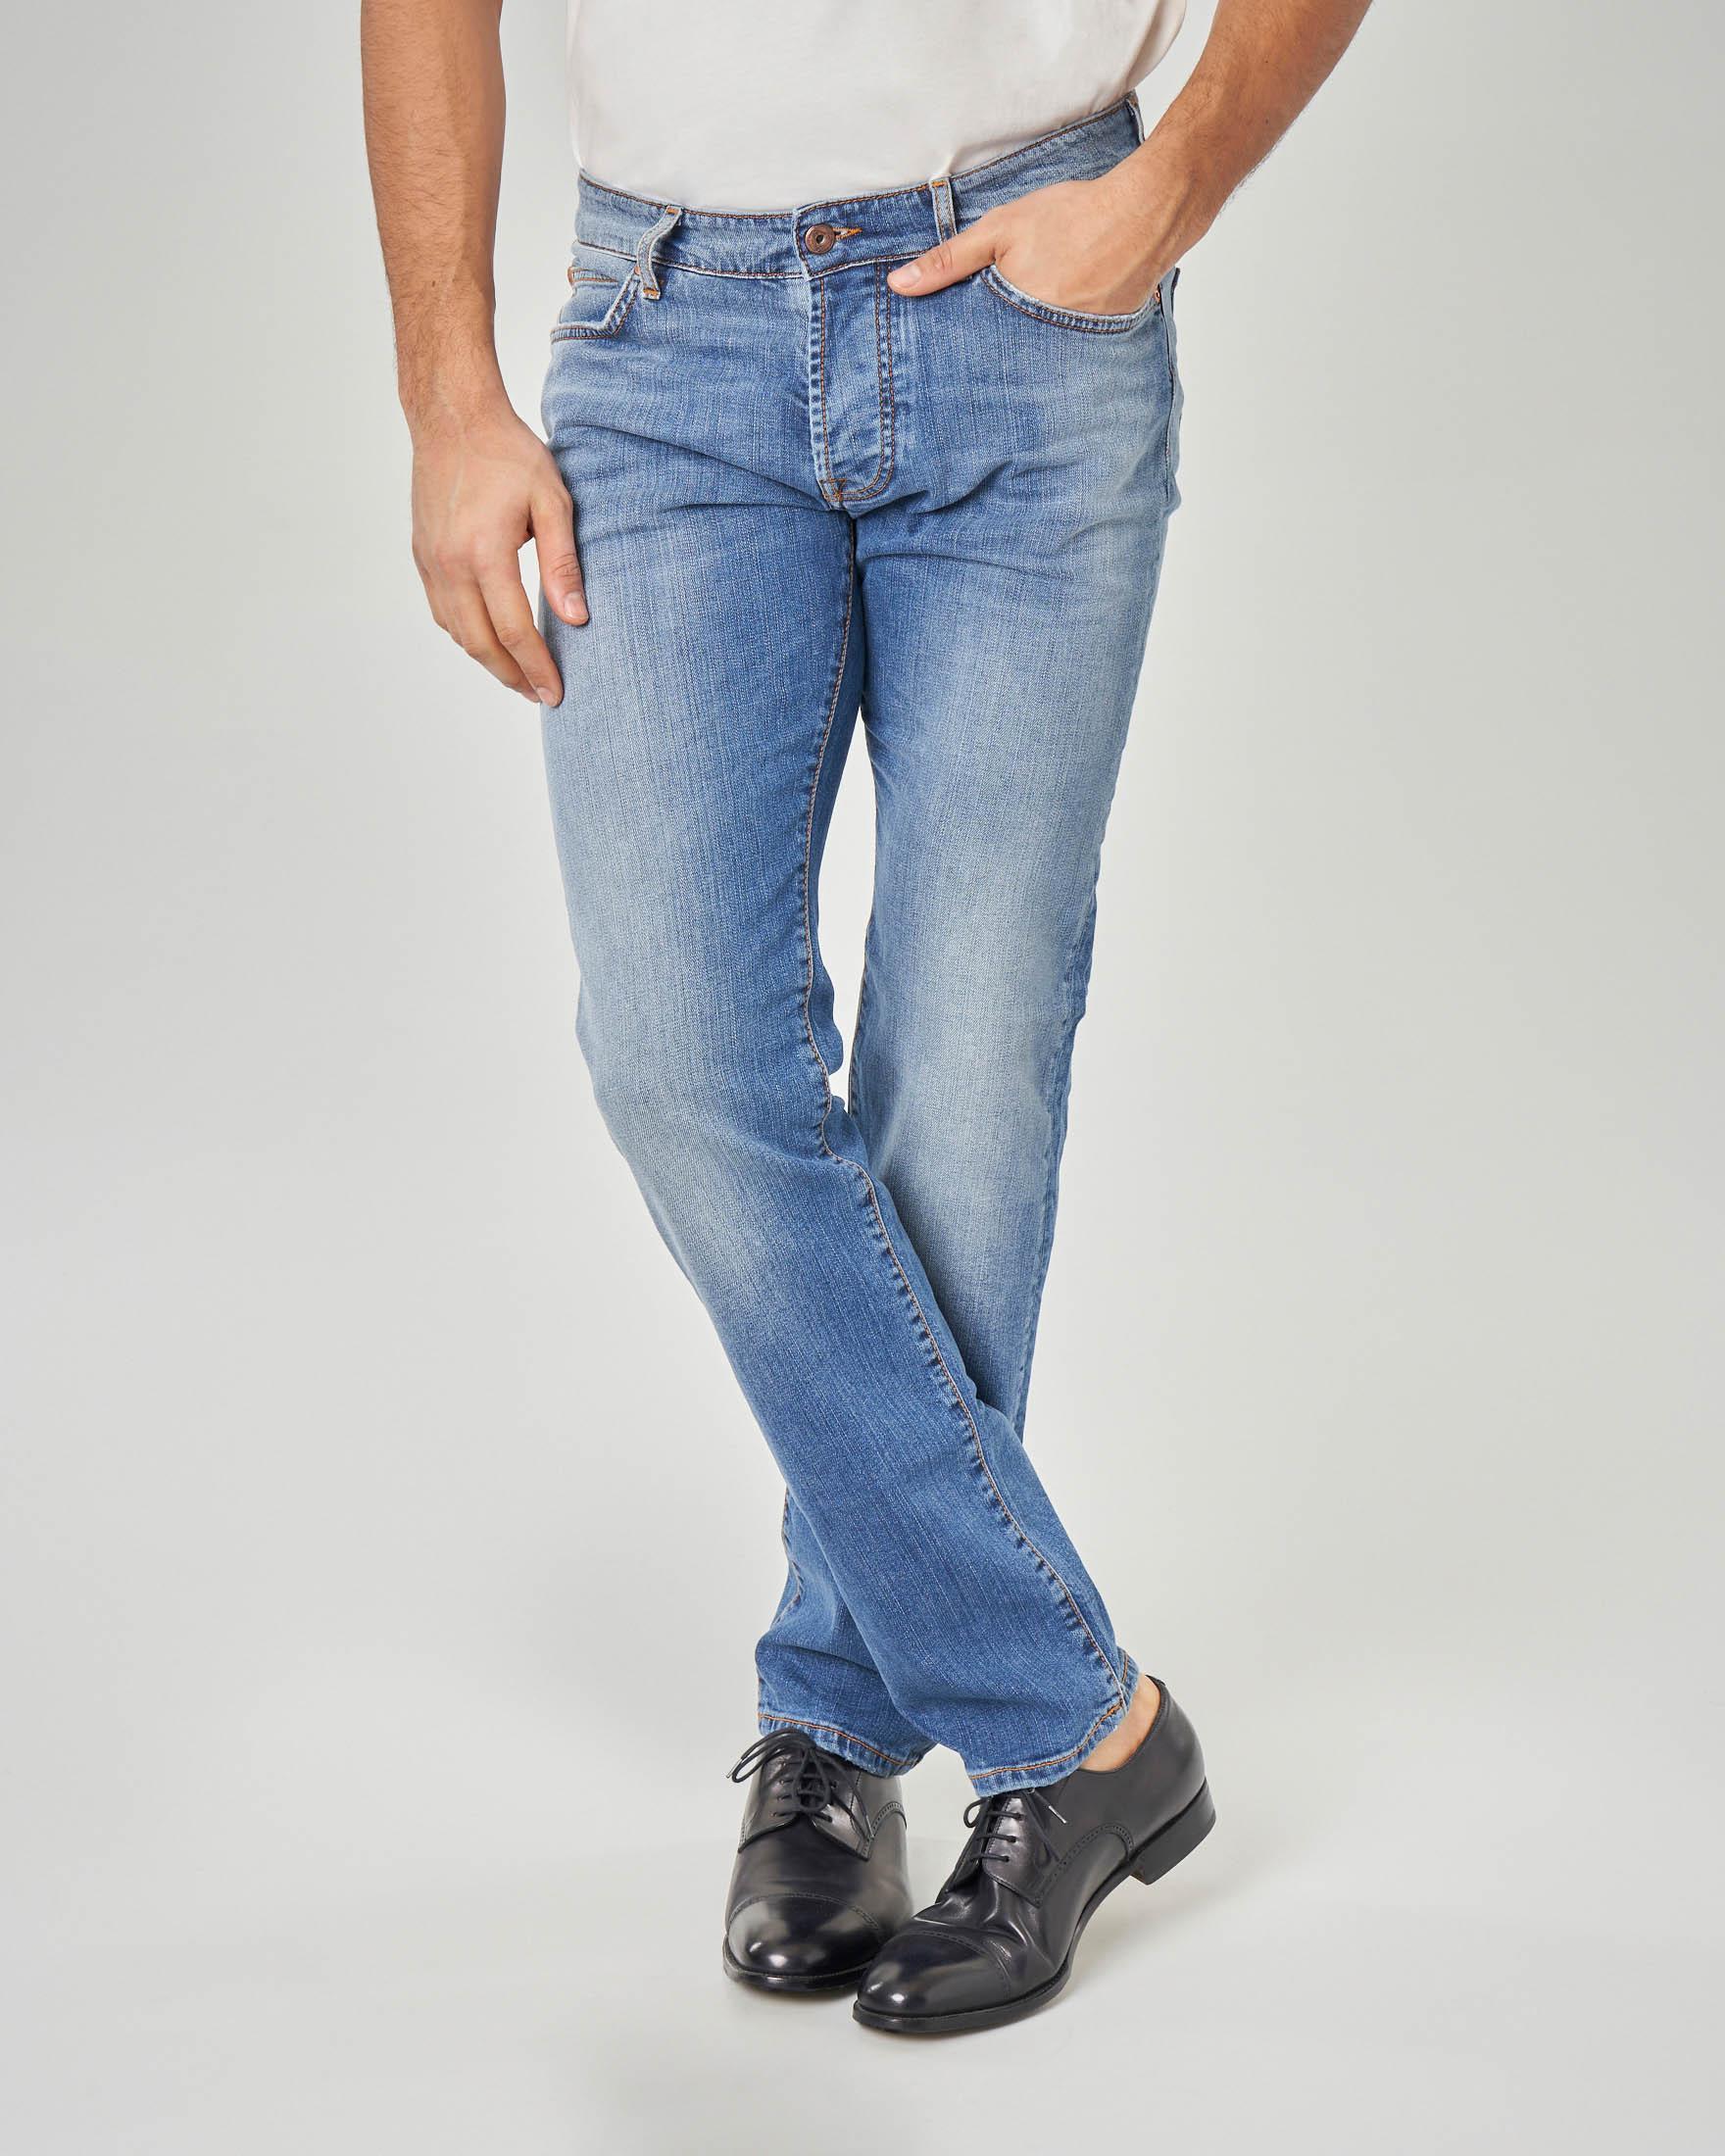 Jeans 529 lavaggio bleach con sabbiature